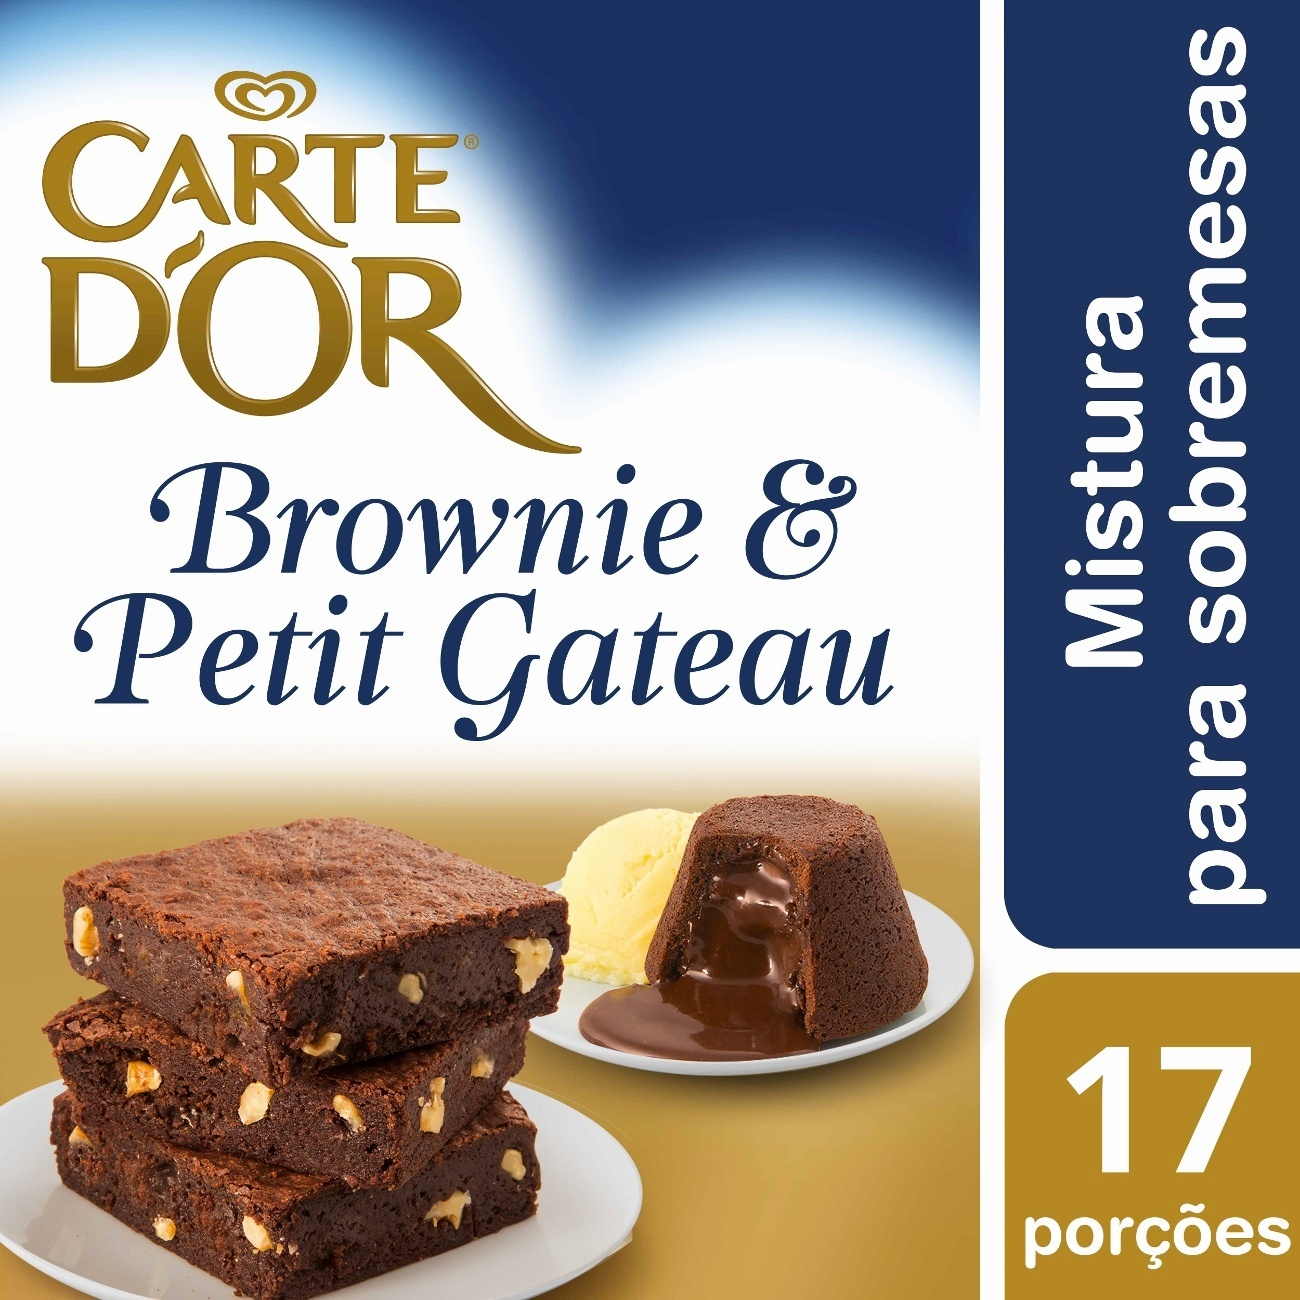 Sobremesa Carte D'Or Brownie e Petit Gateau 800g | 1 unidades